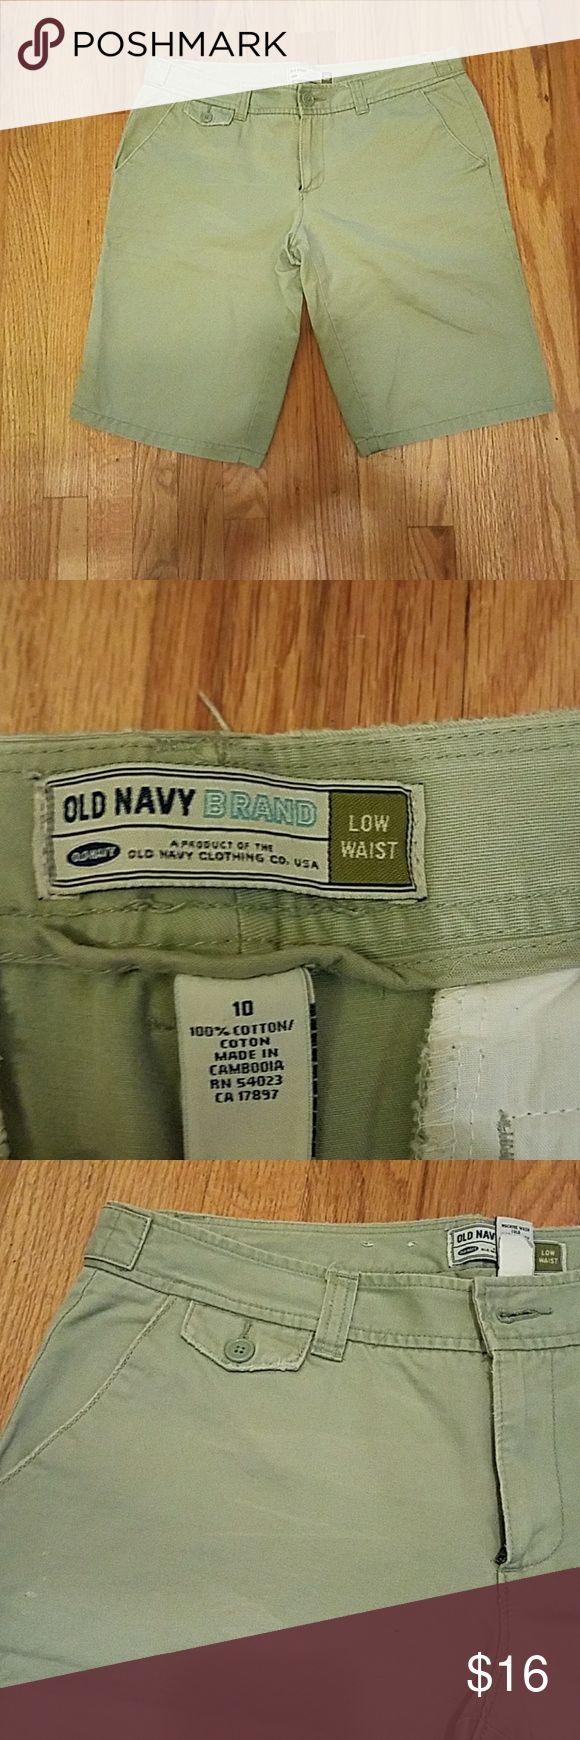 Old Navu bermuda shorts Old Navy, khaki, Bermuda shorts, size 10 Old Navy Shorts Bermudas